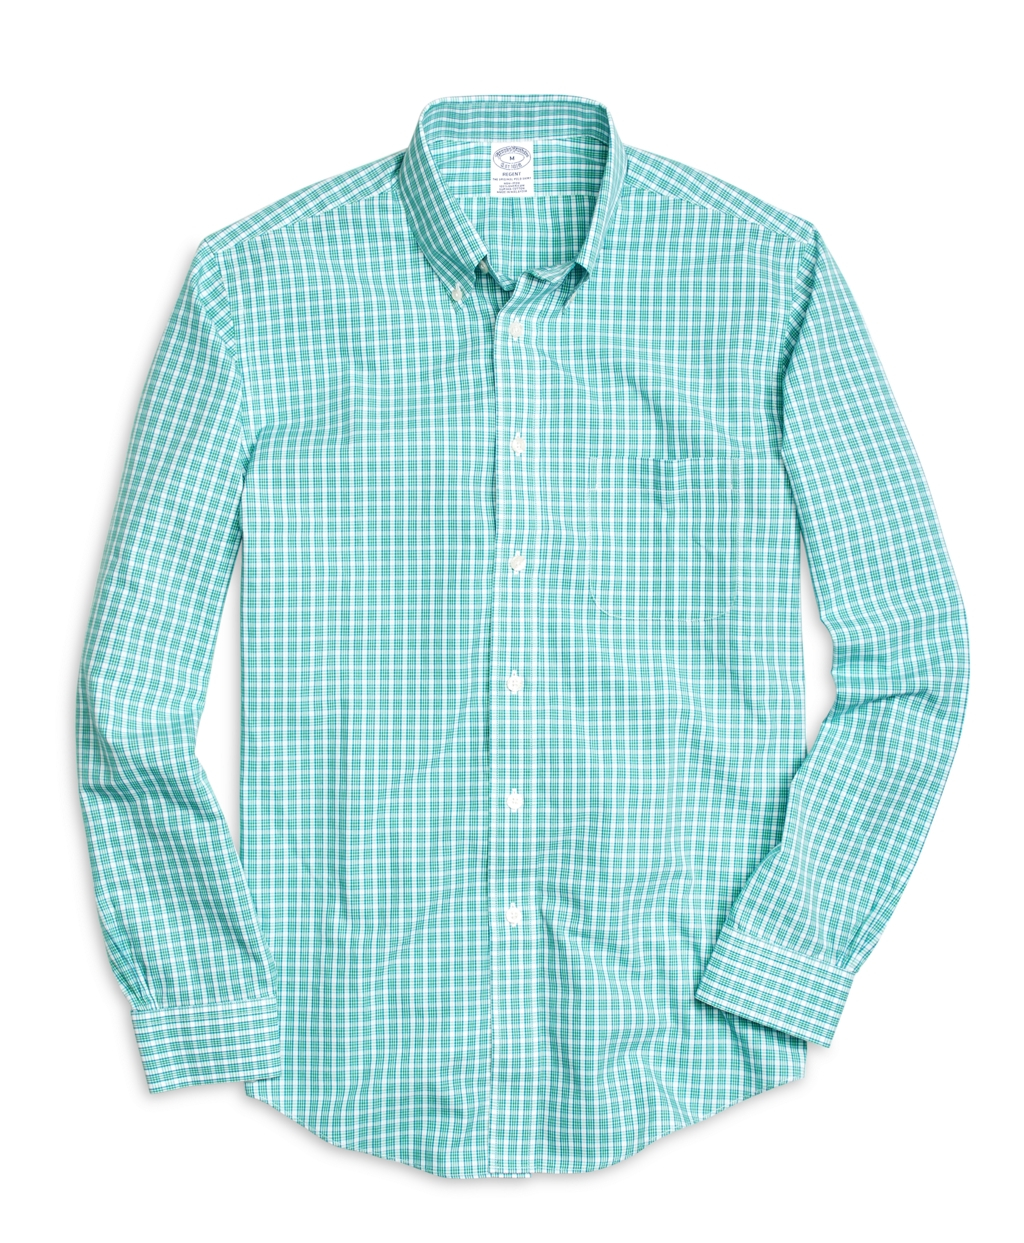 Brooks brothers non iron brookscool madison fit small for Brooks brothers non iron shirts review